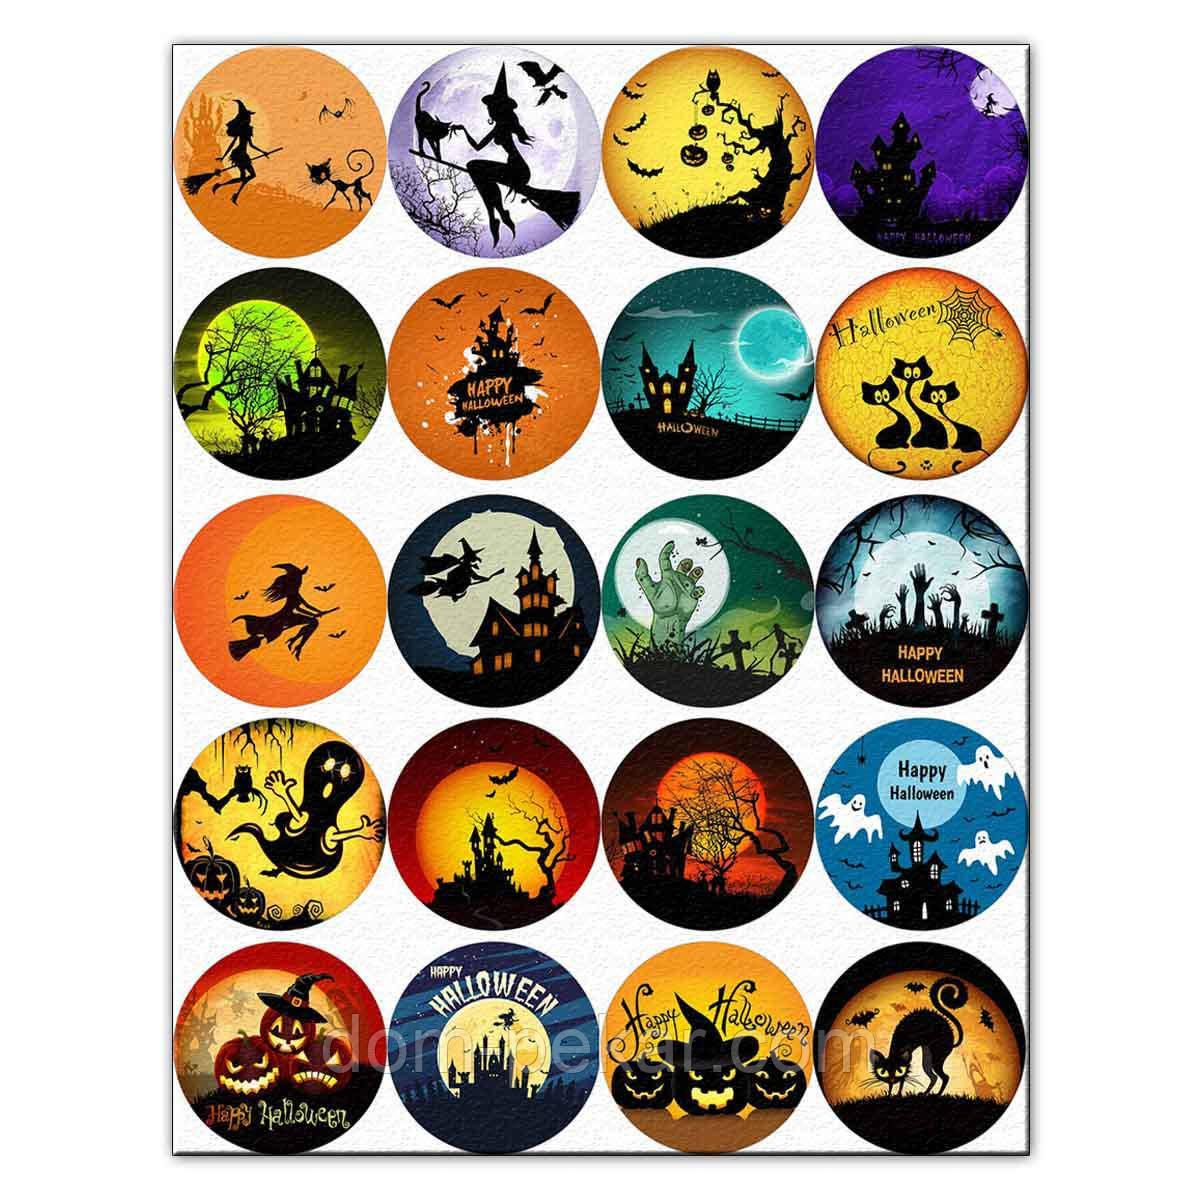 Капкейки-5 см Хеллоуин-1 вафельна картинка